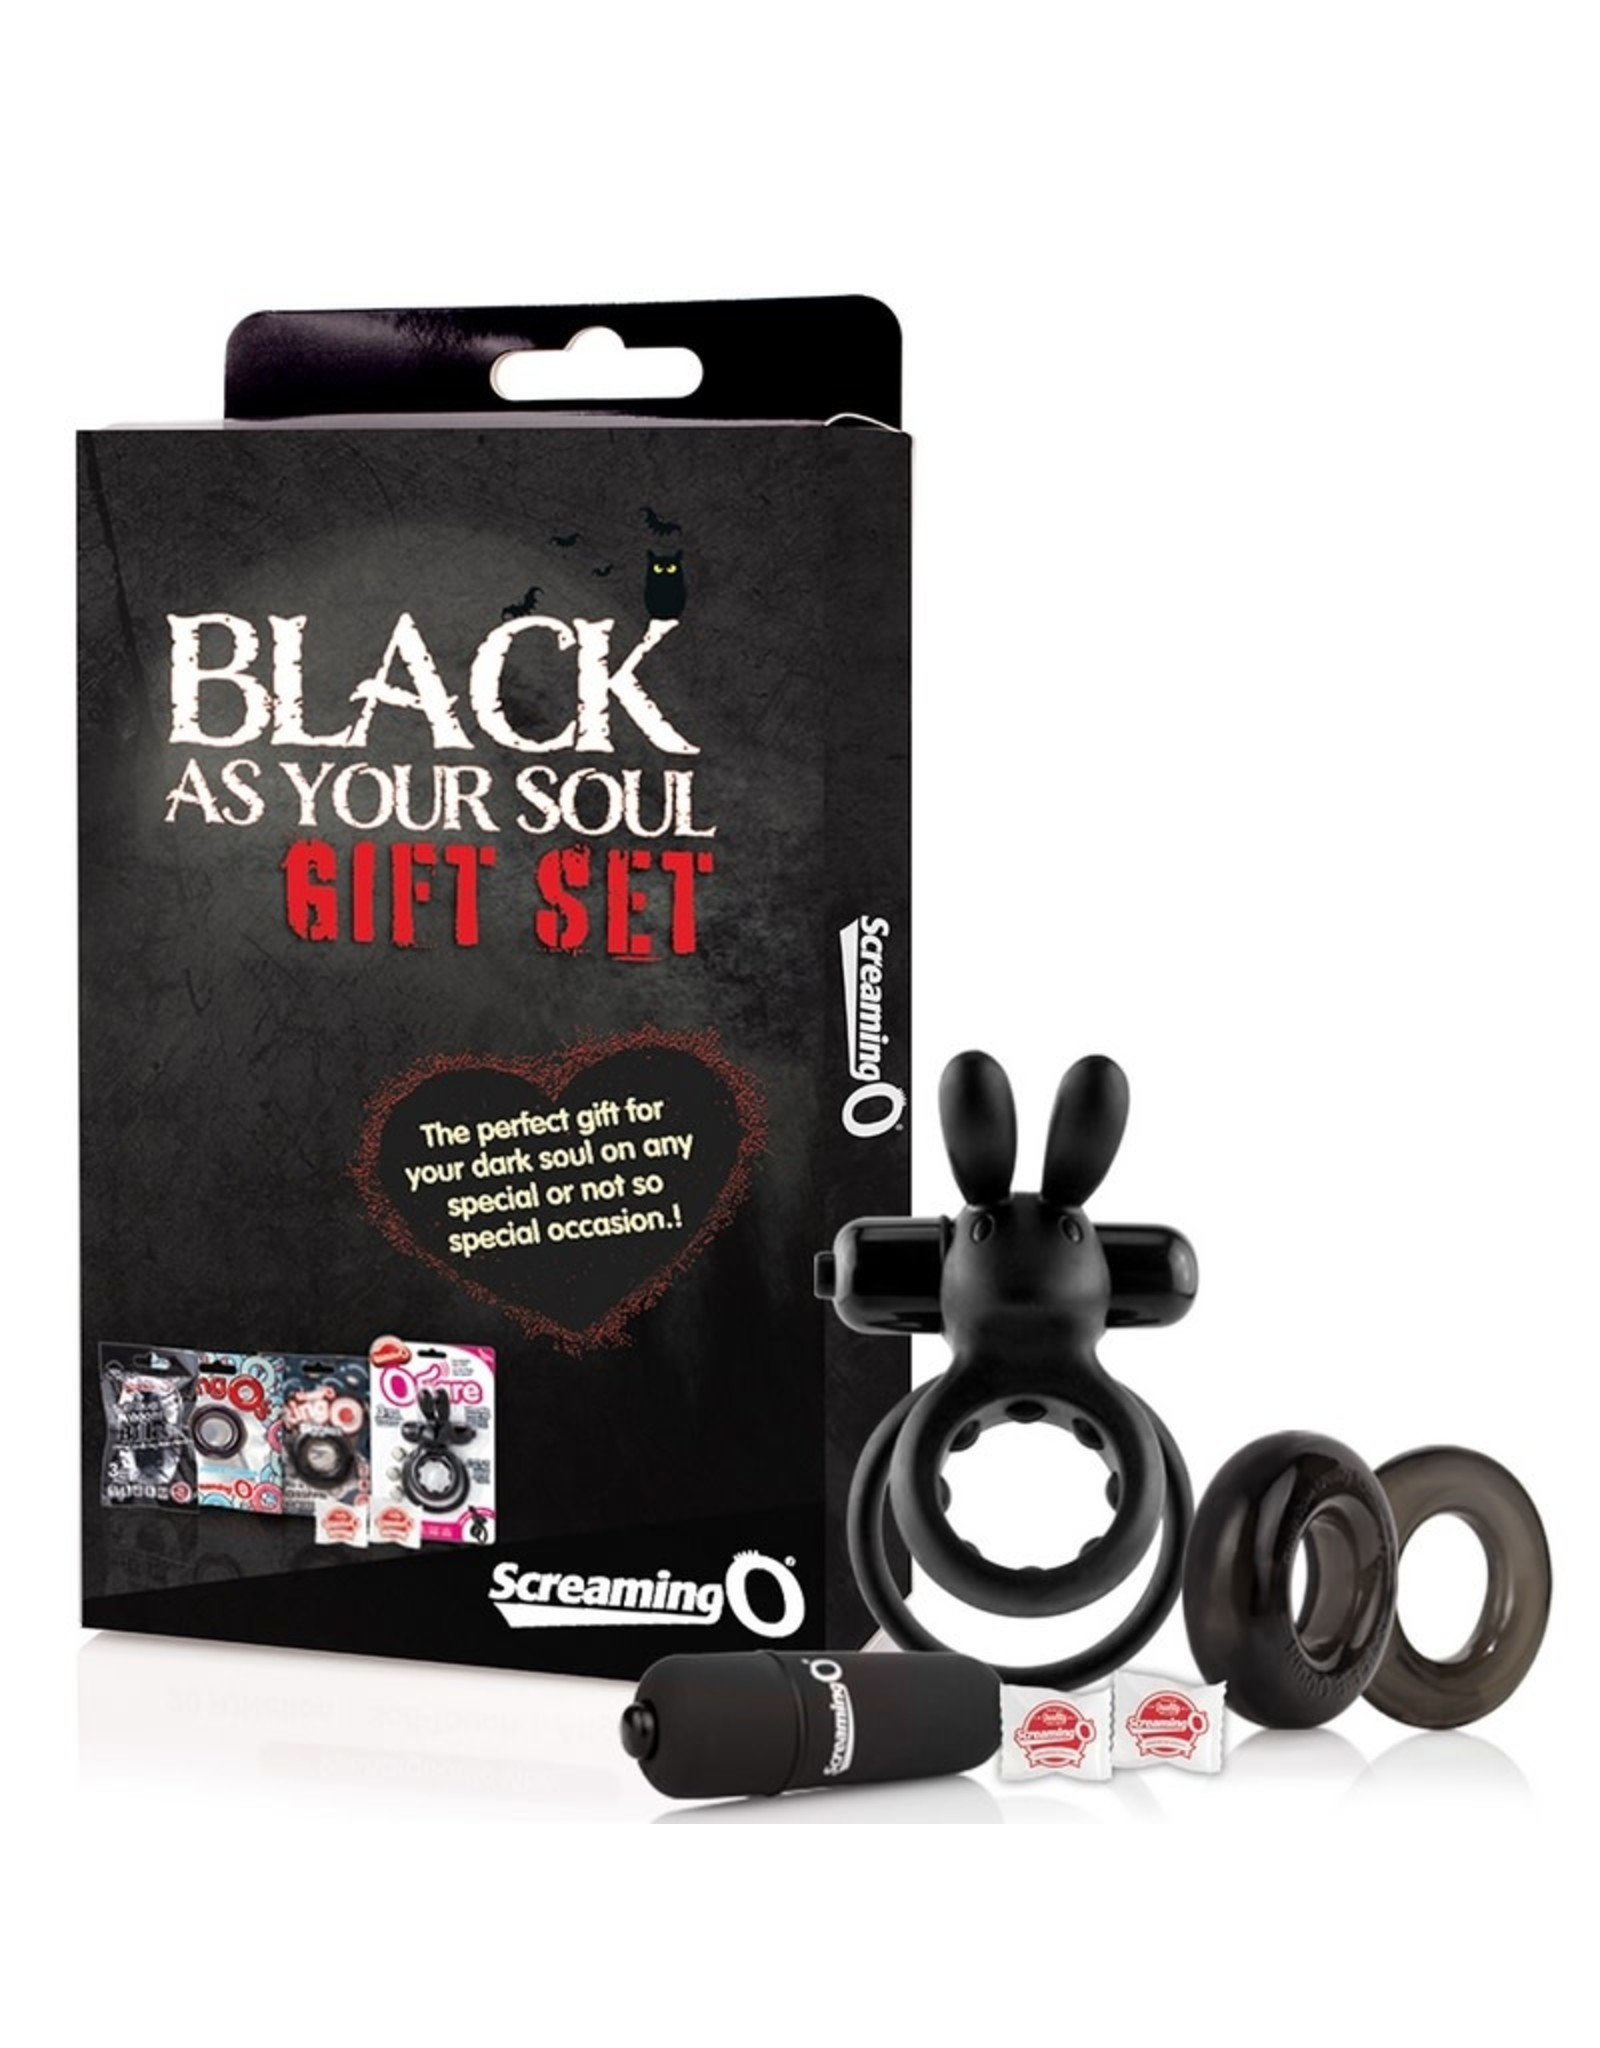 Screaming O BLACK AS YOUR SOUL GIFT SET